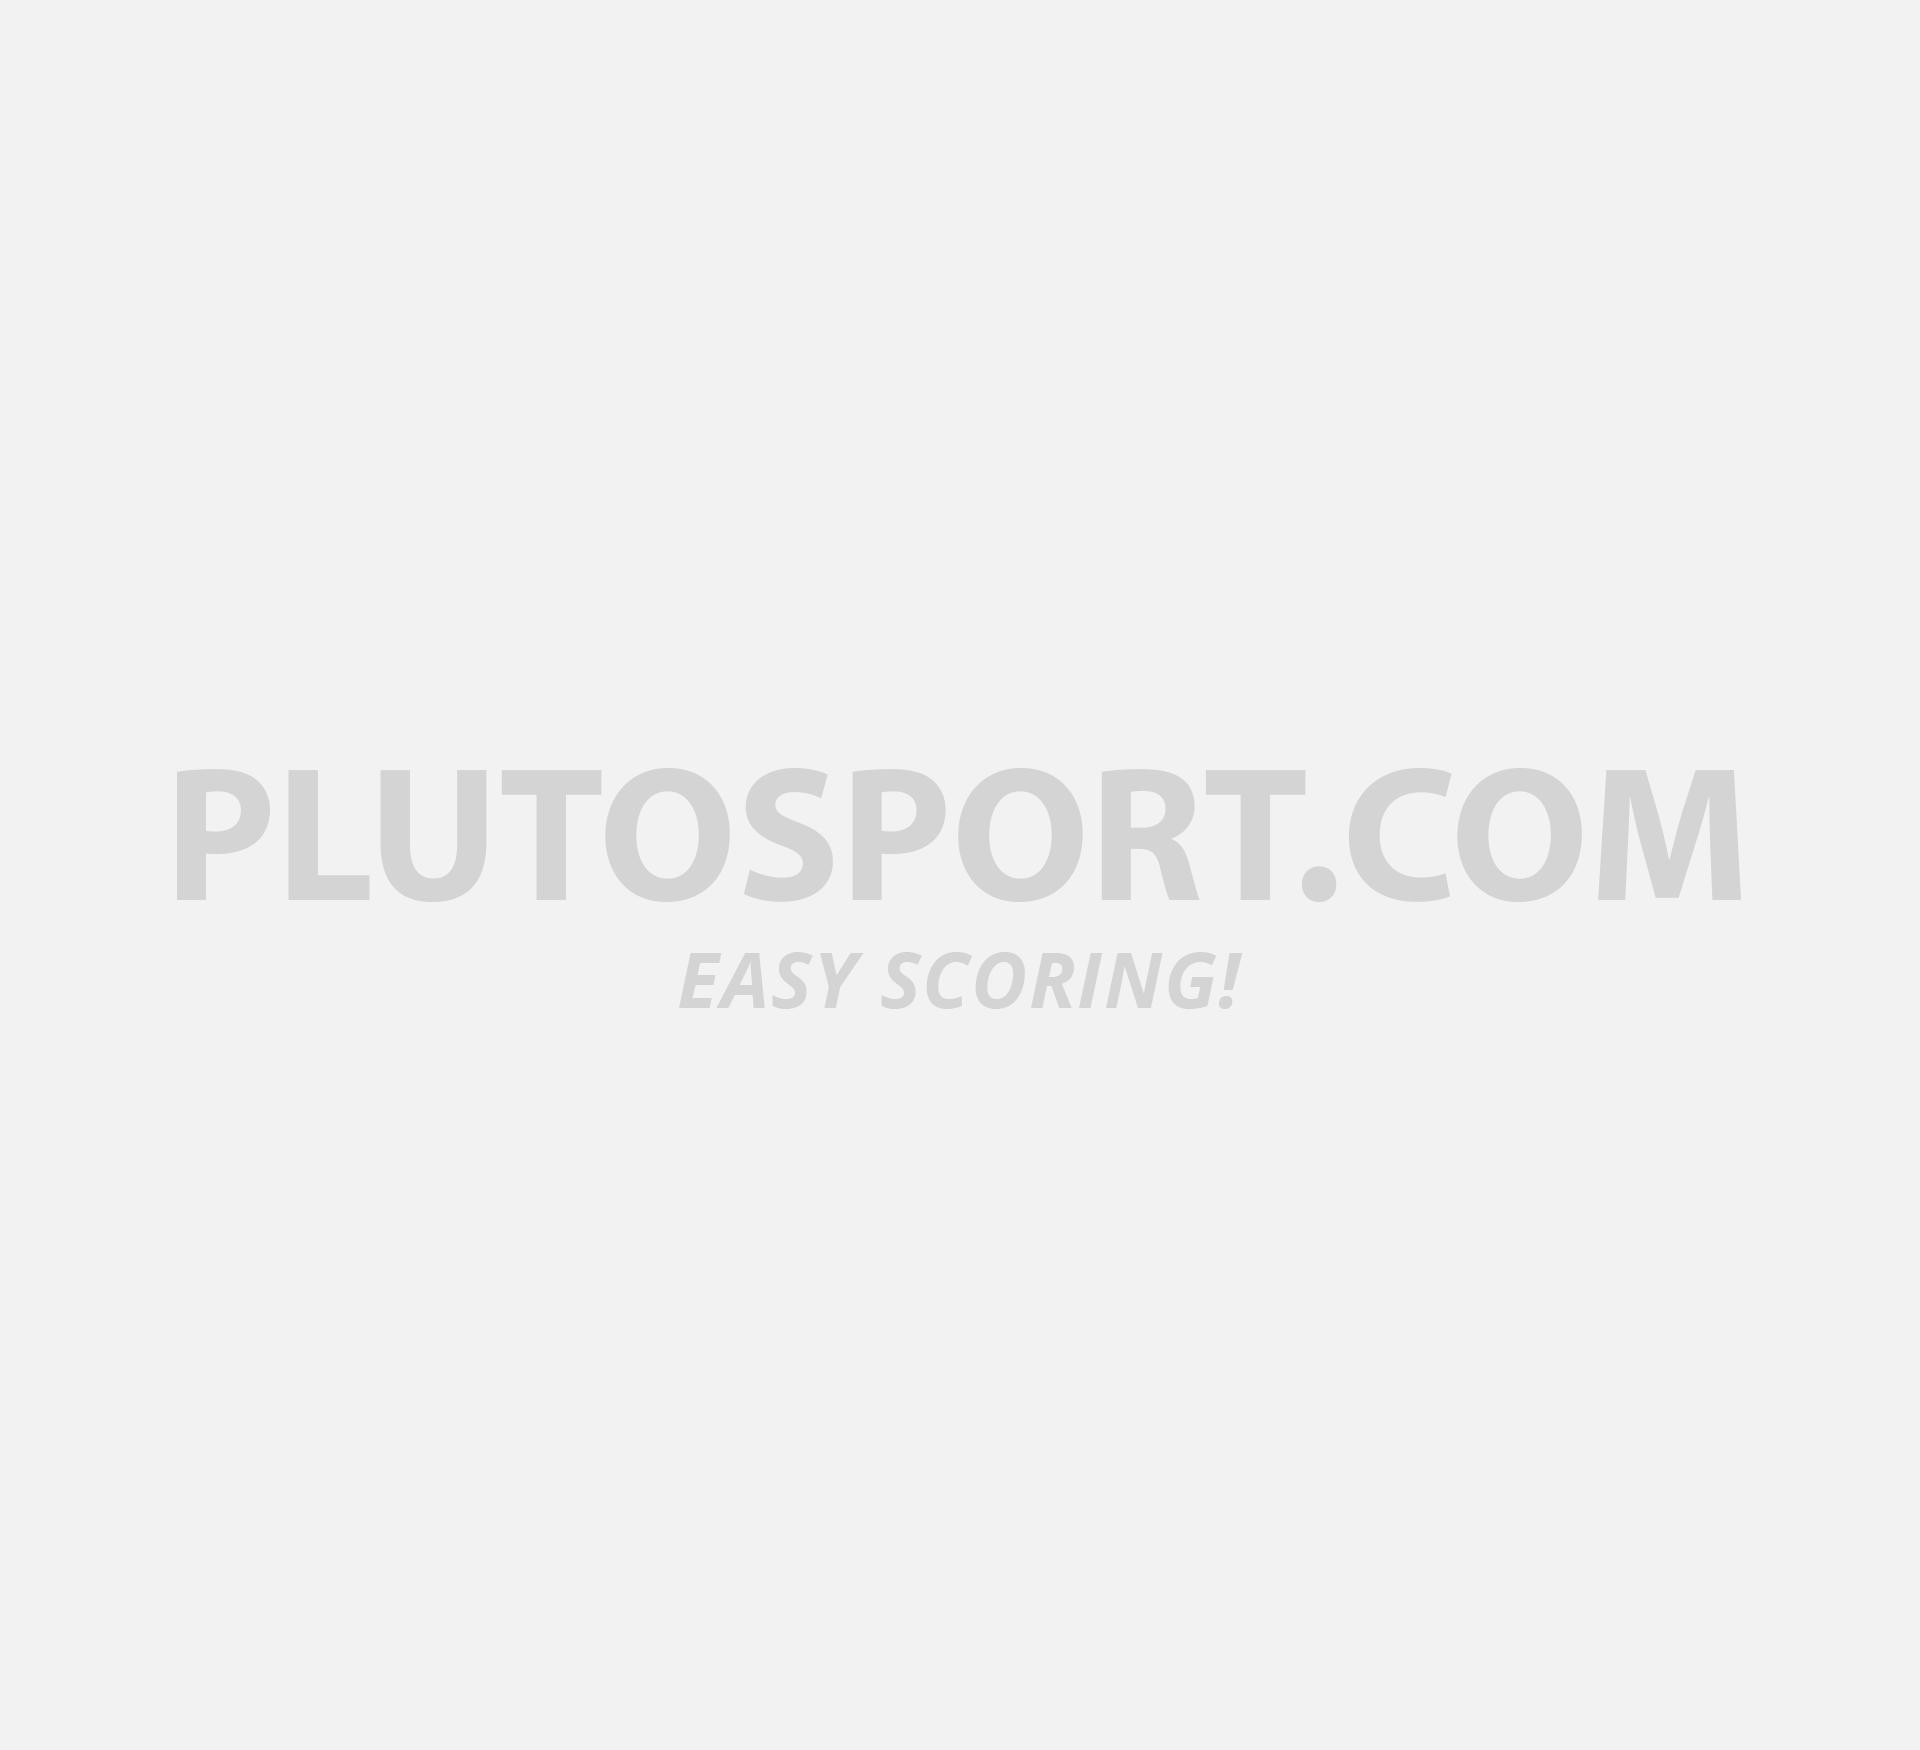 huge selection of 543a4 1480b Asics Gel-Kayano 21 - Overpronation - Shoes - Running - Sports   Plutosport